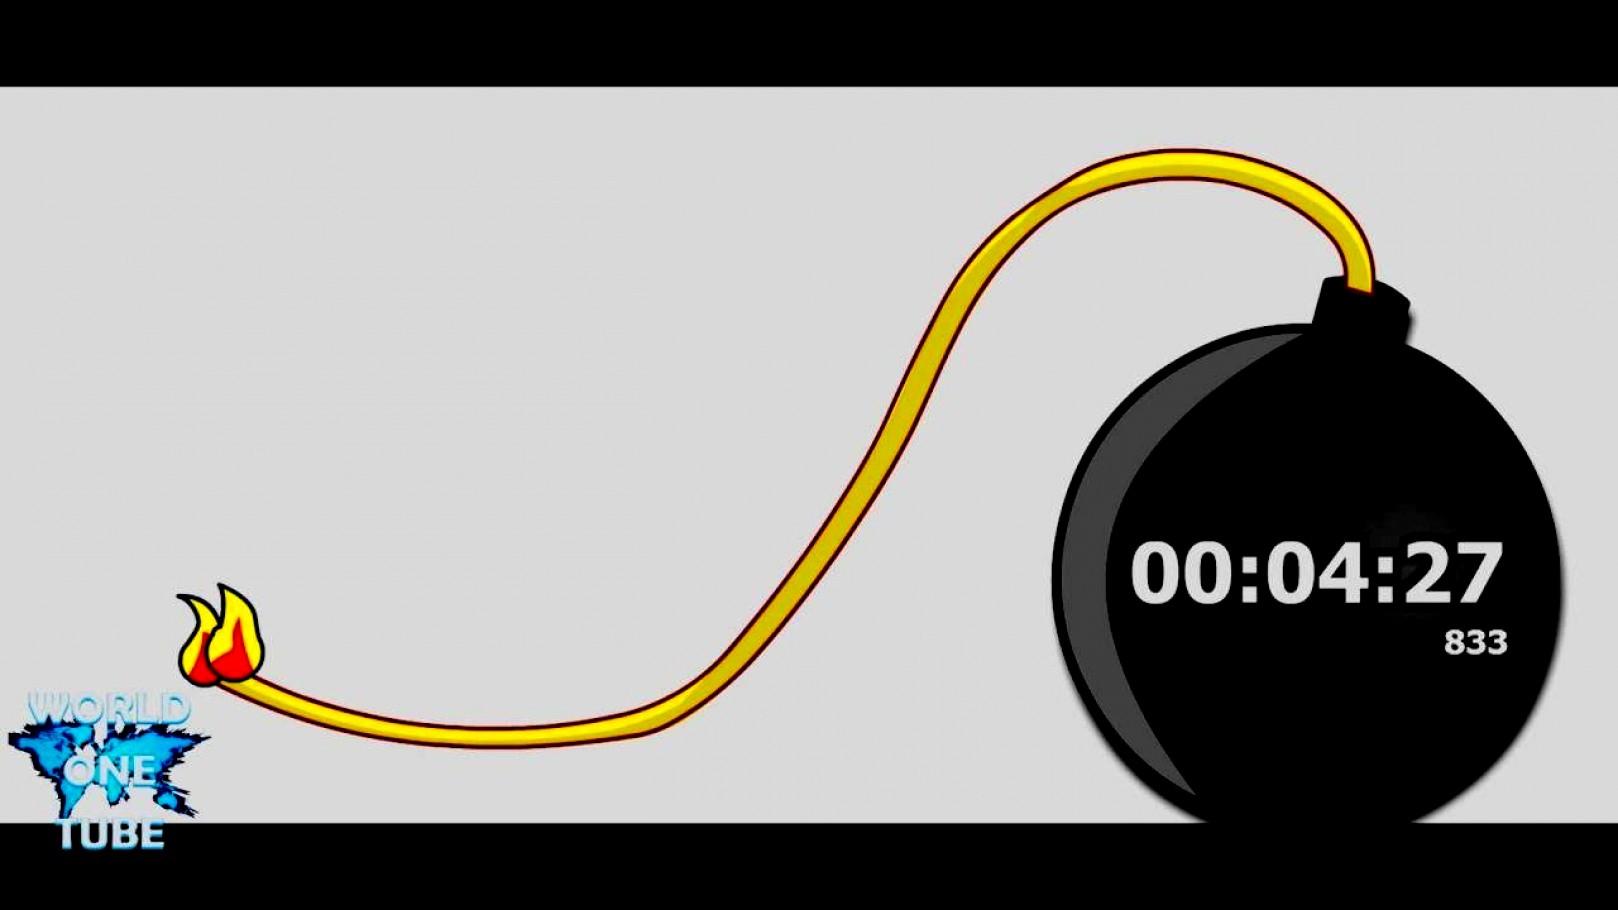 Set Timer for 5 Mins Beautiful Elegant Set Timer to 5 Minutes Minute